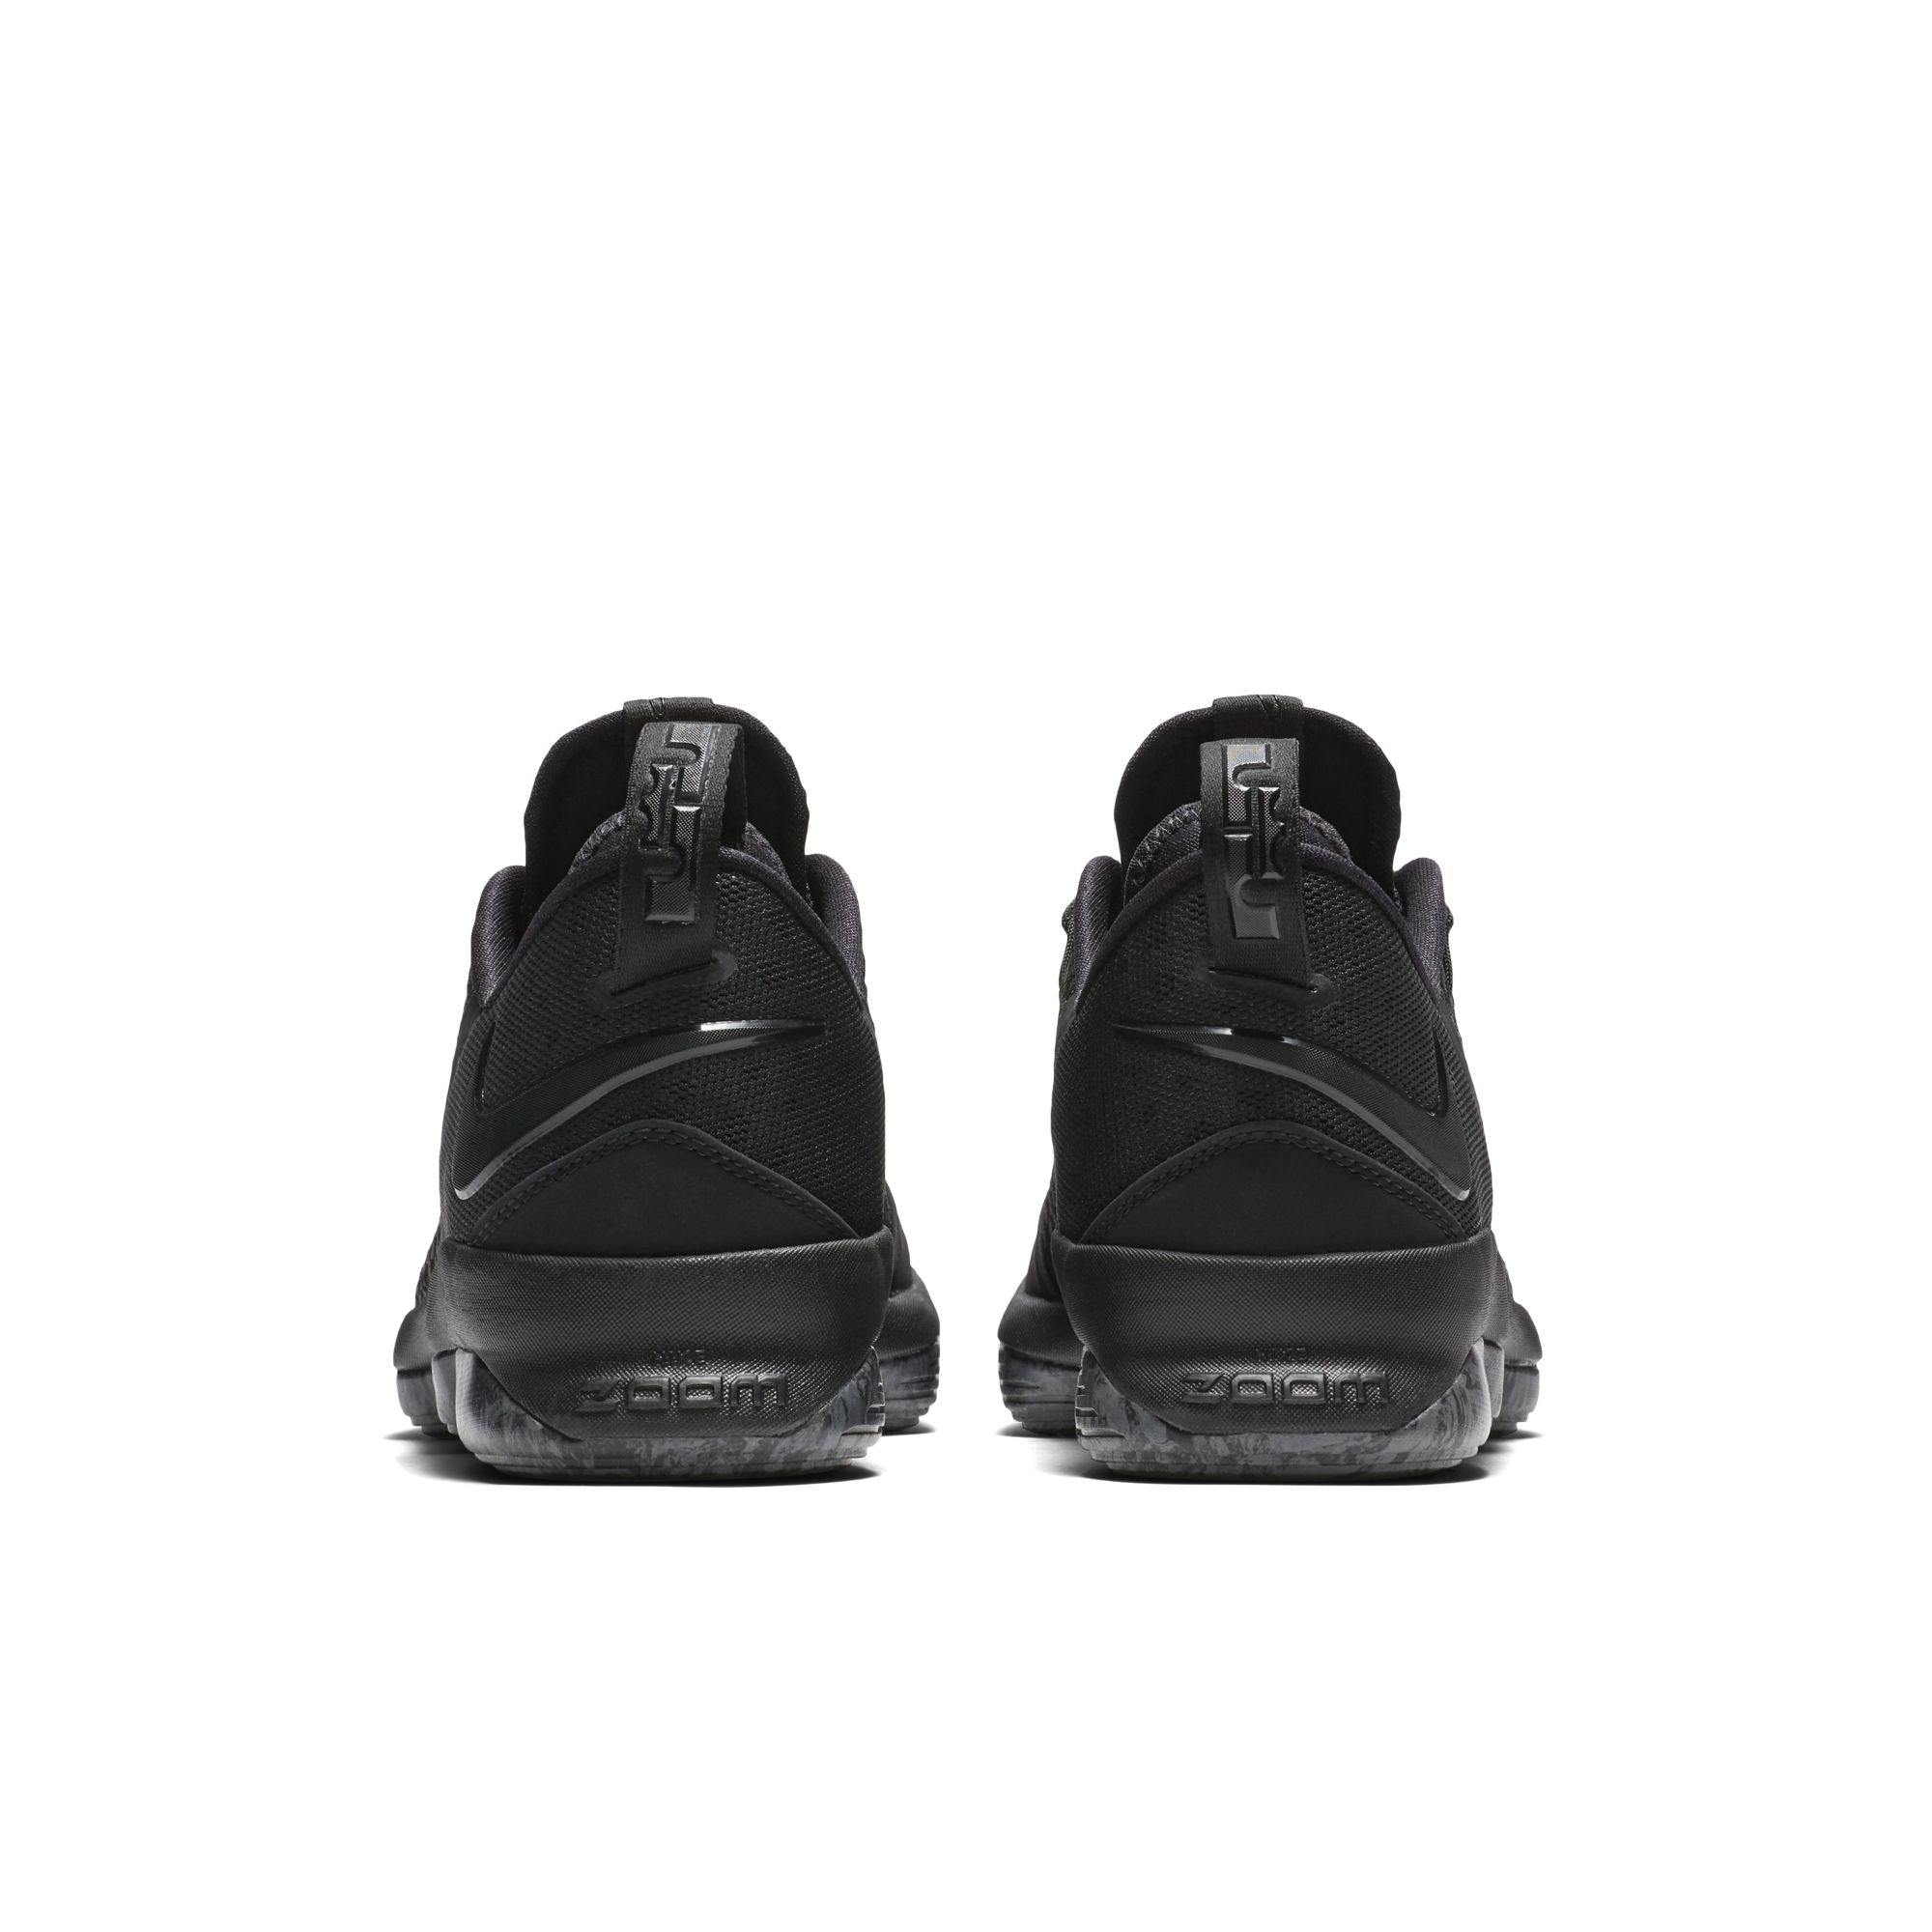 huge selection of 45ec6 94faa Nike-LeBron-14-Low-Black-5 - WearTesters